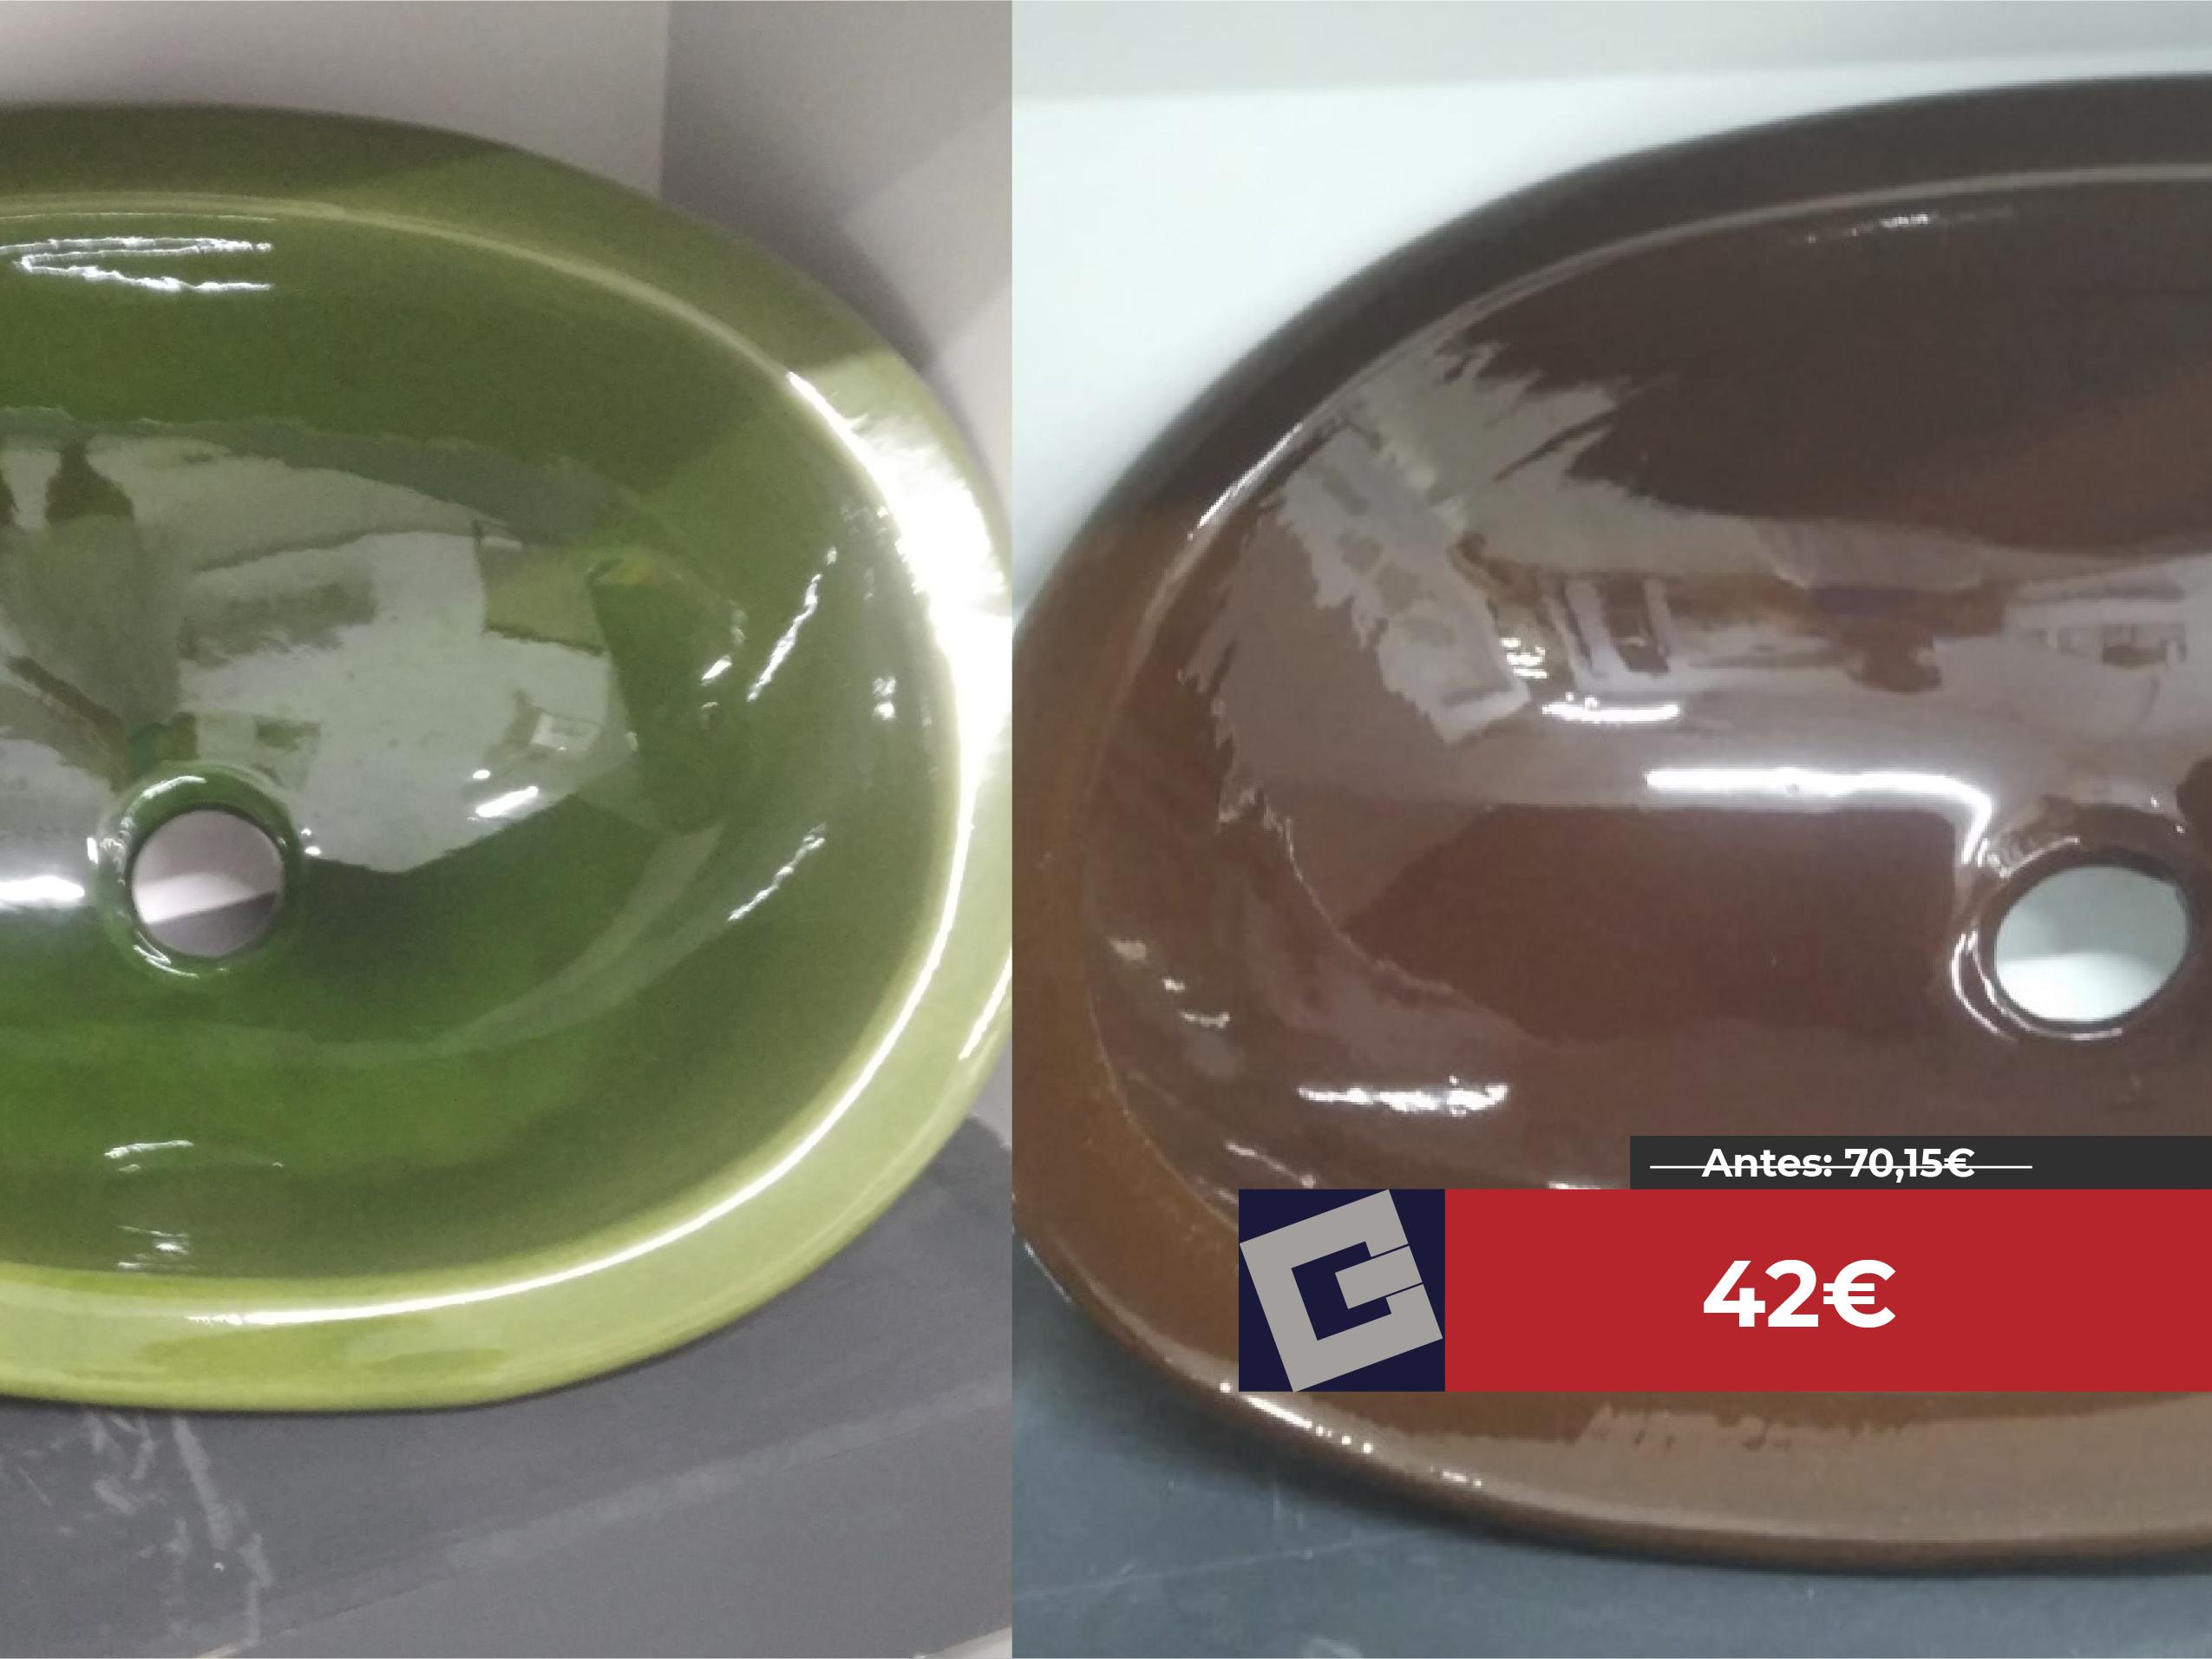 Fregadera ovalada vidriada C.Est 52X40 marrón/verde